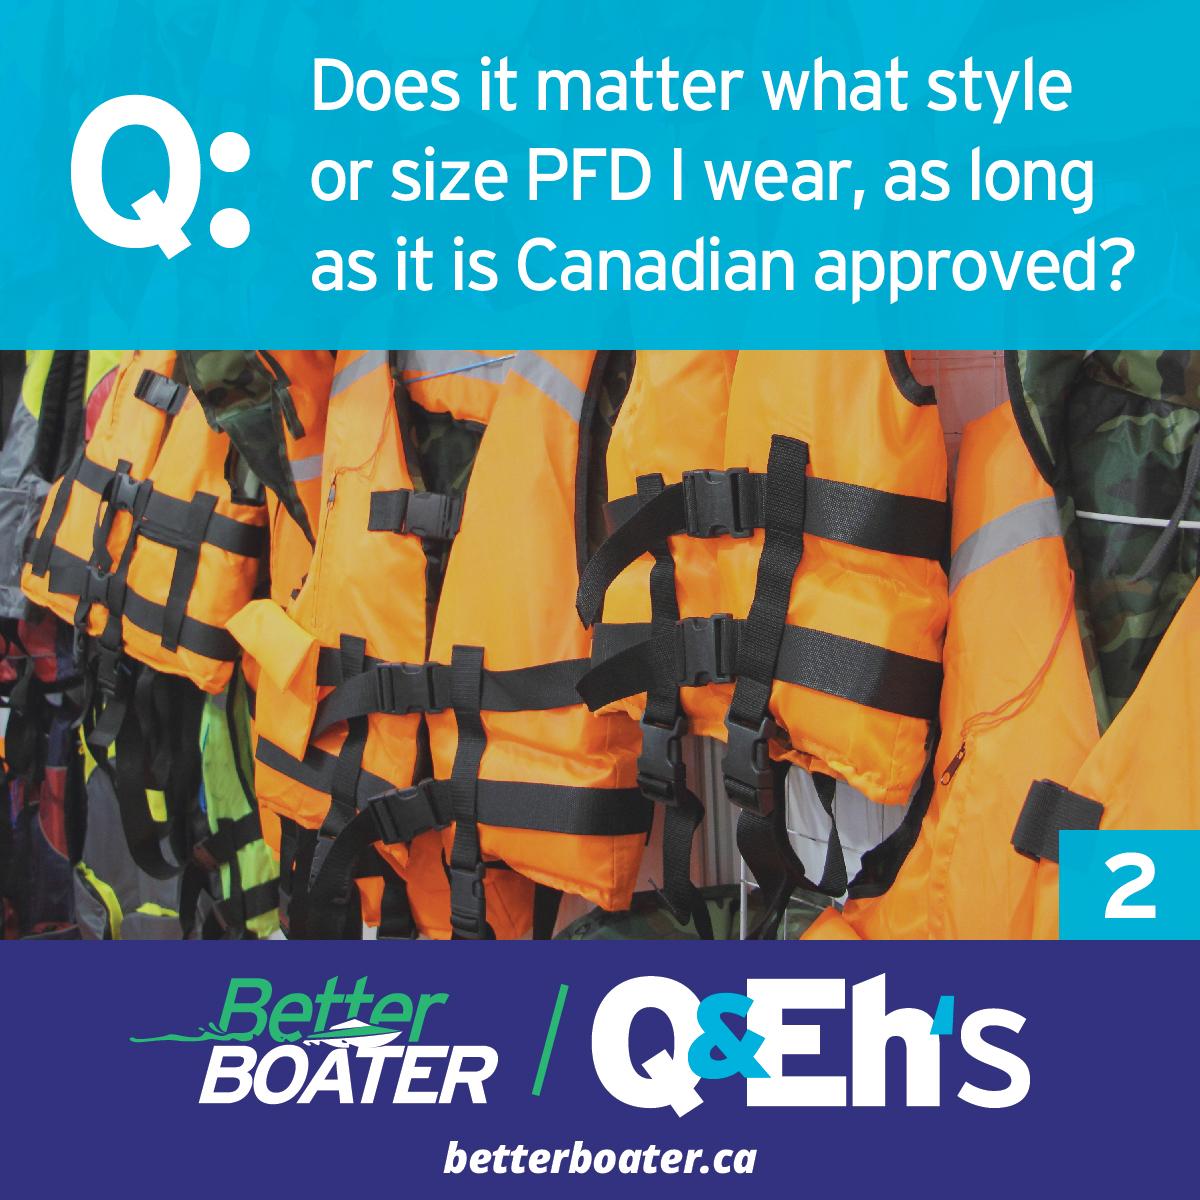 https://betterboater.ca/Q&Eh:%20Lifejacket%20Size